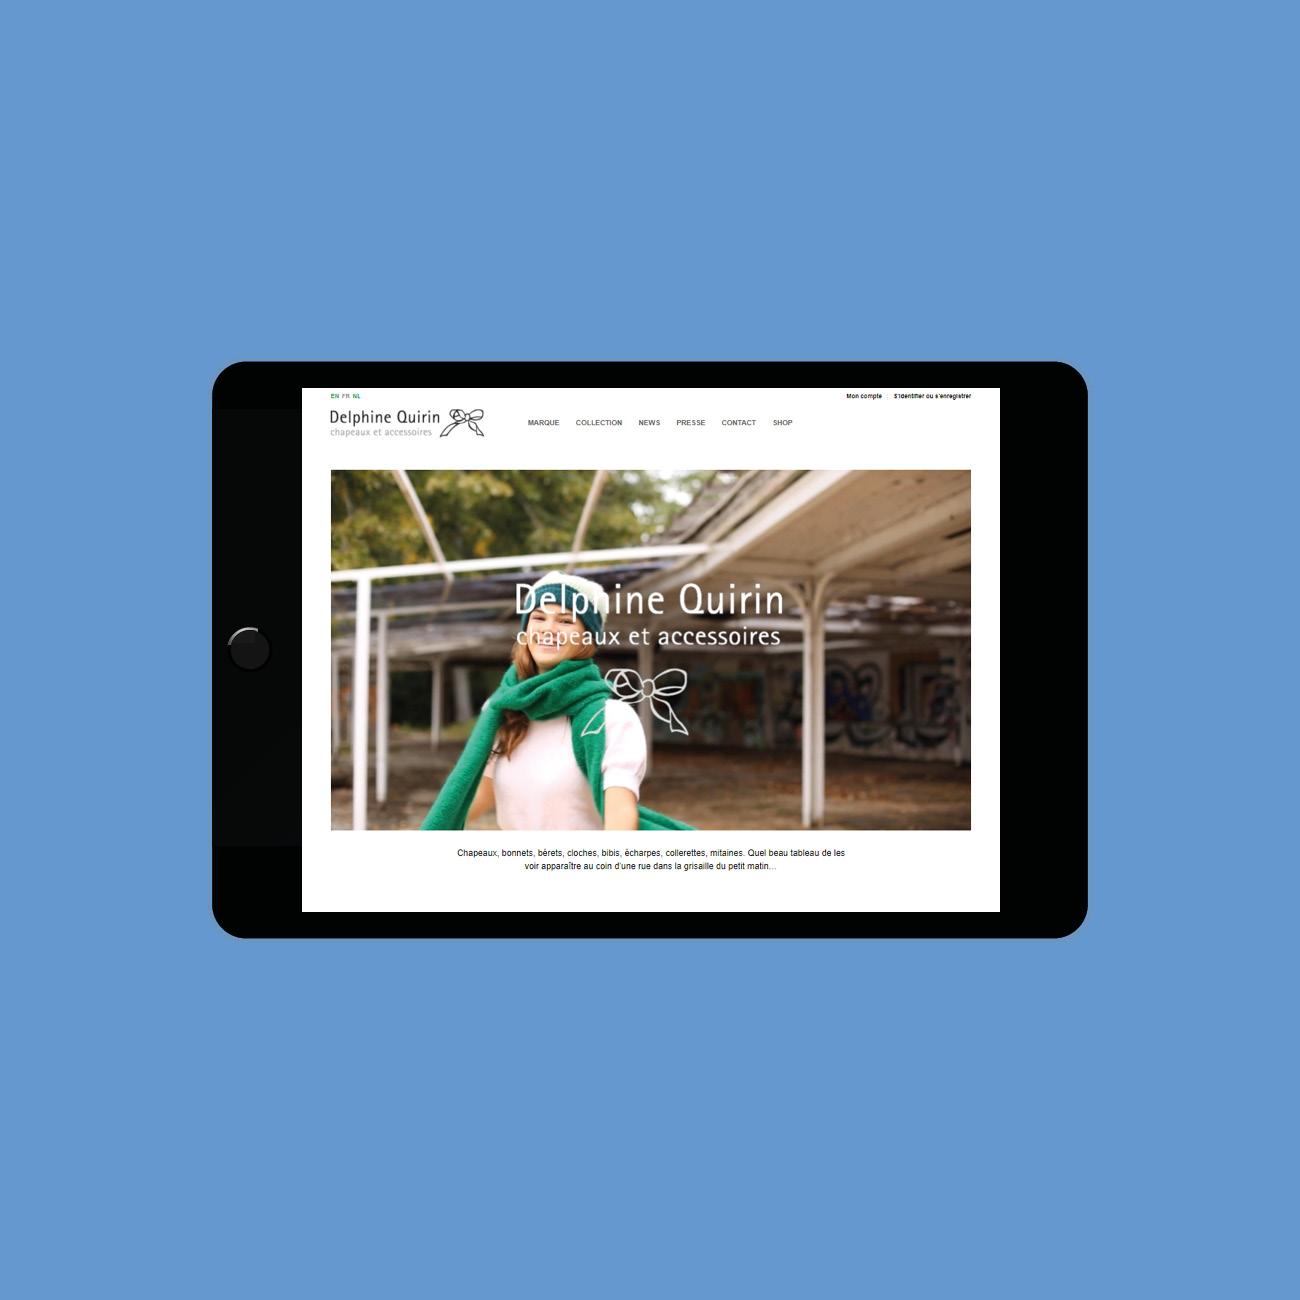 Miko Digital Agence web à Liège - E-commerce Delphine Quirrin